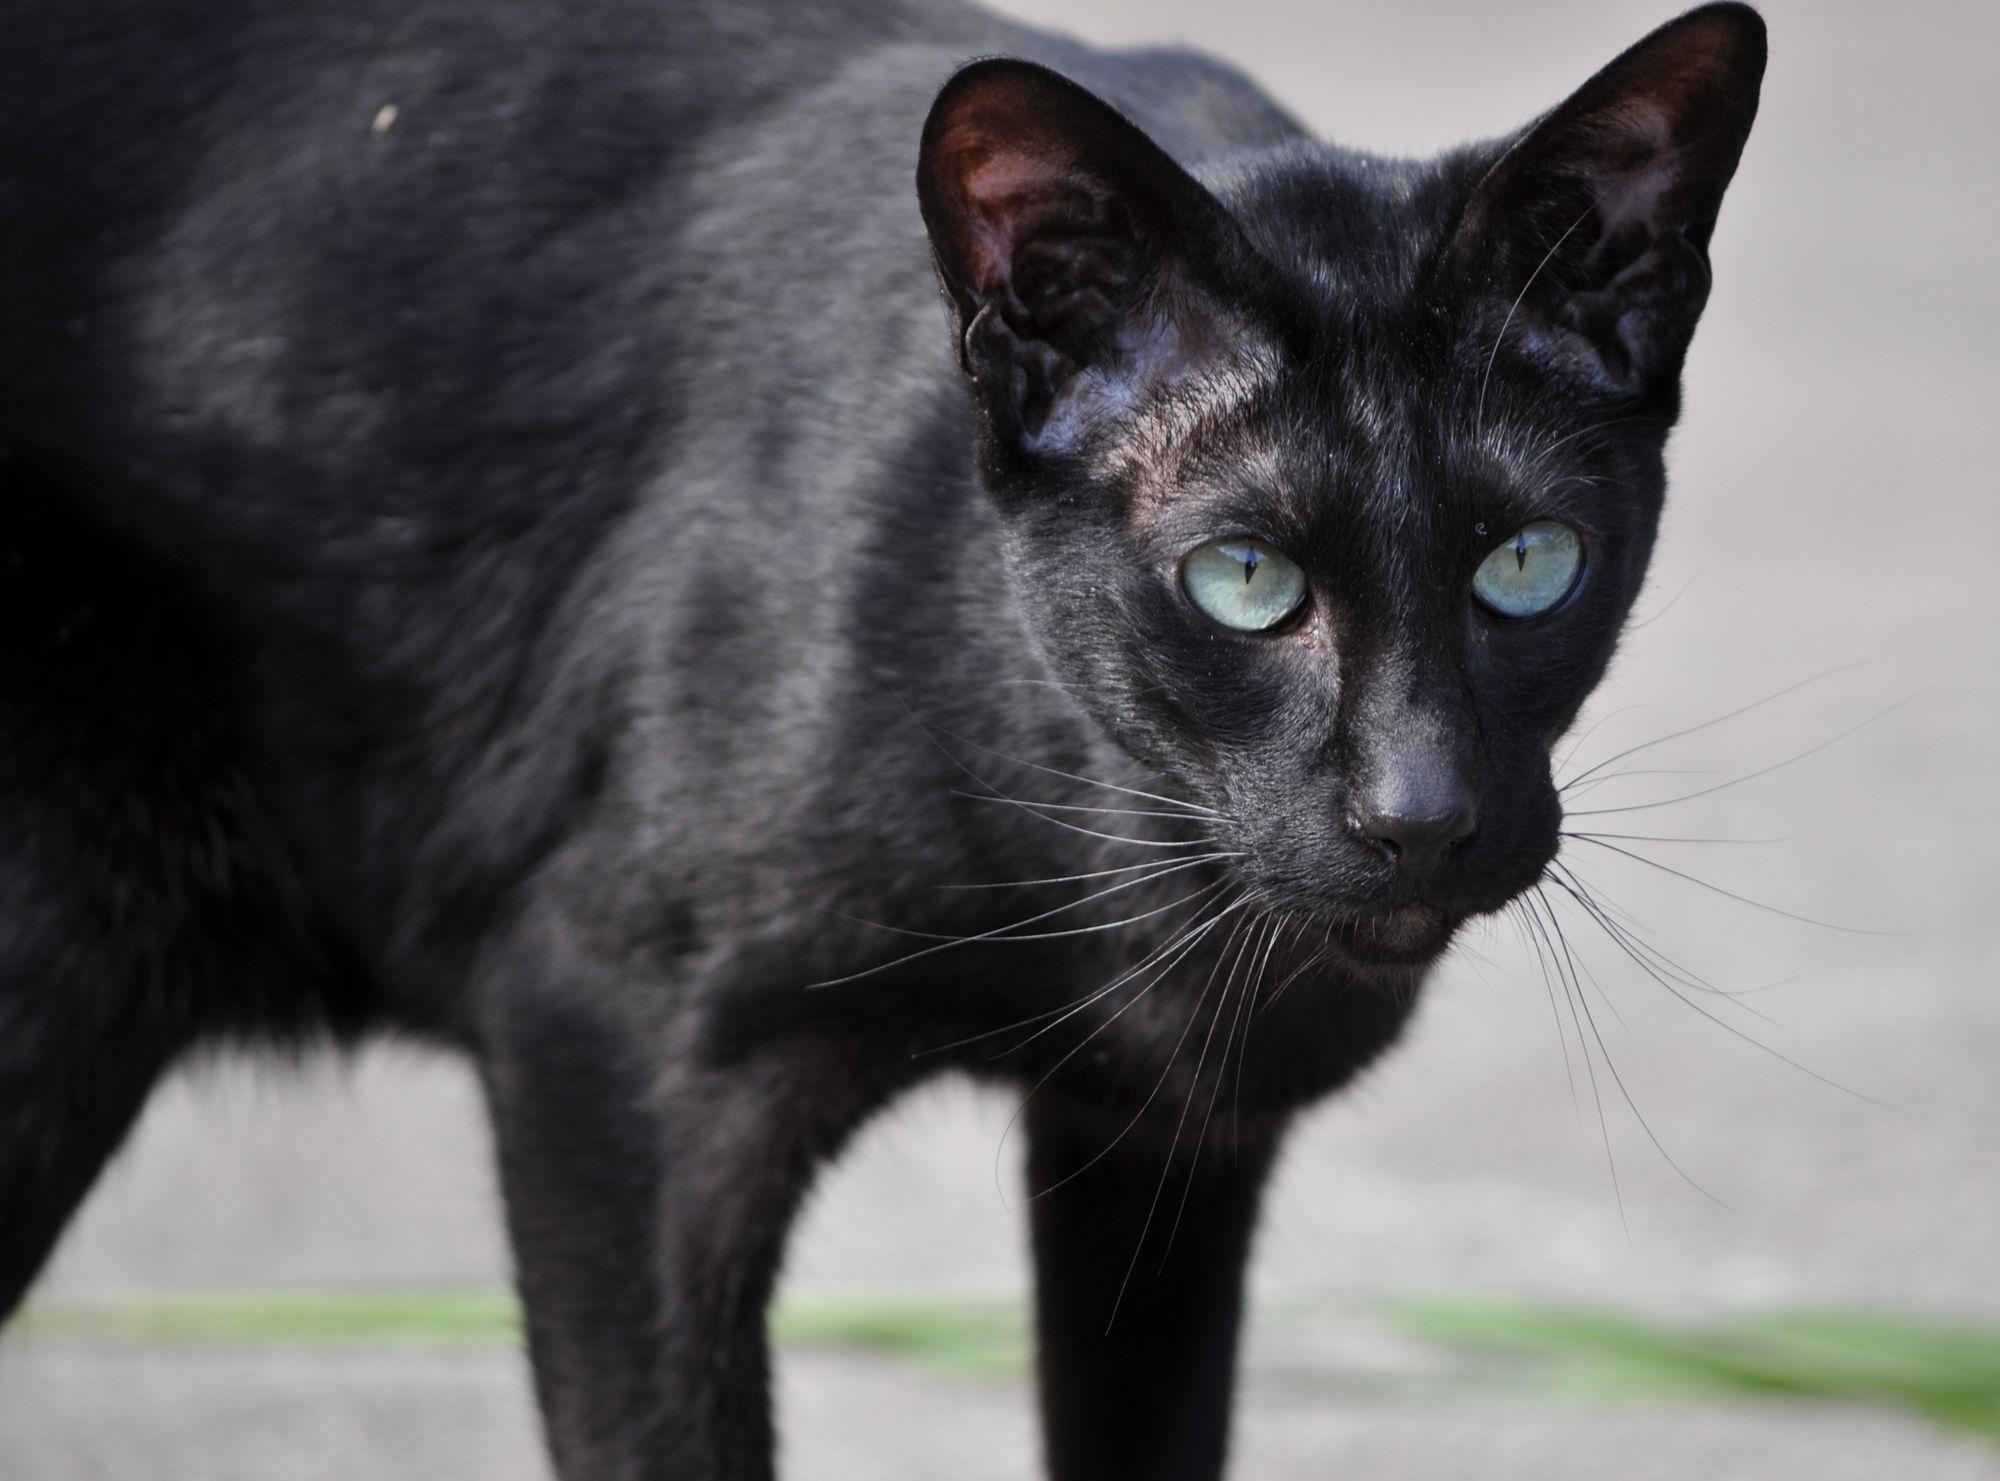 world images spike cat large